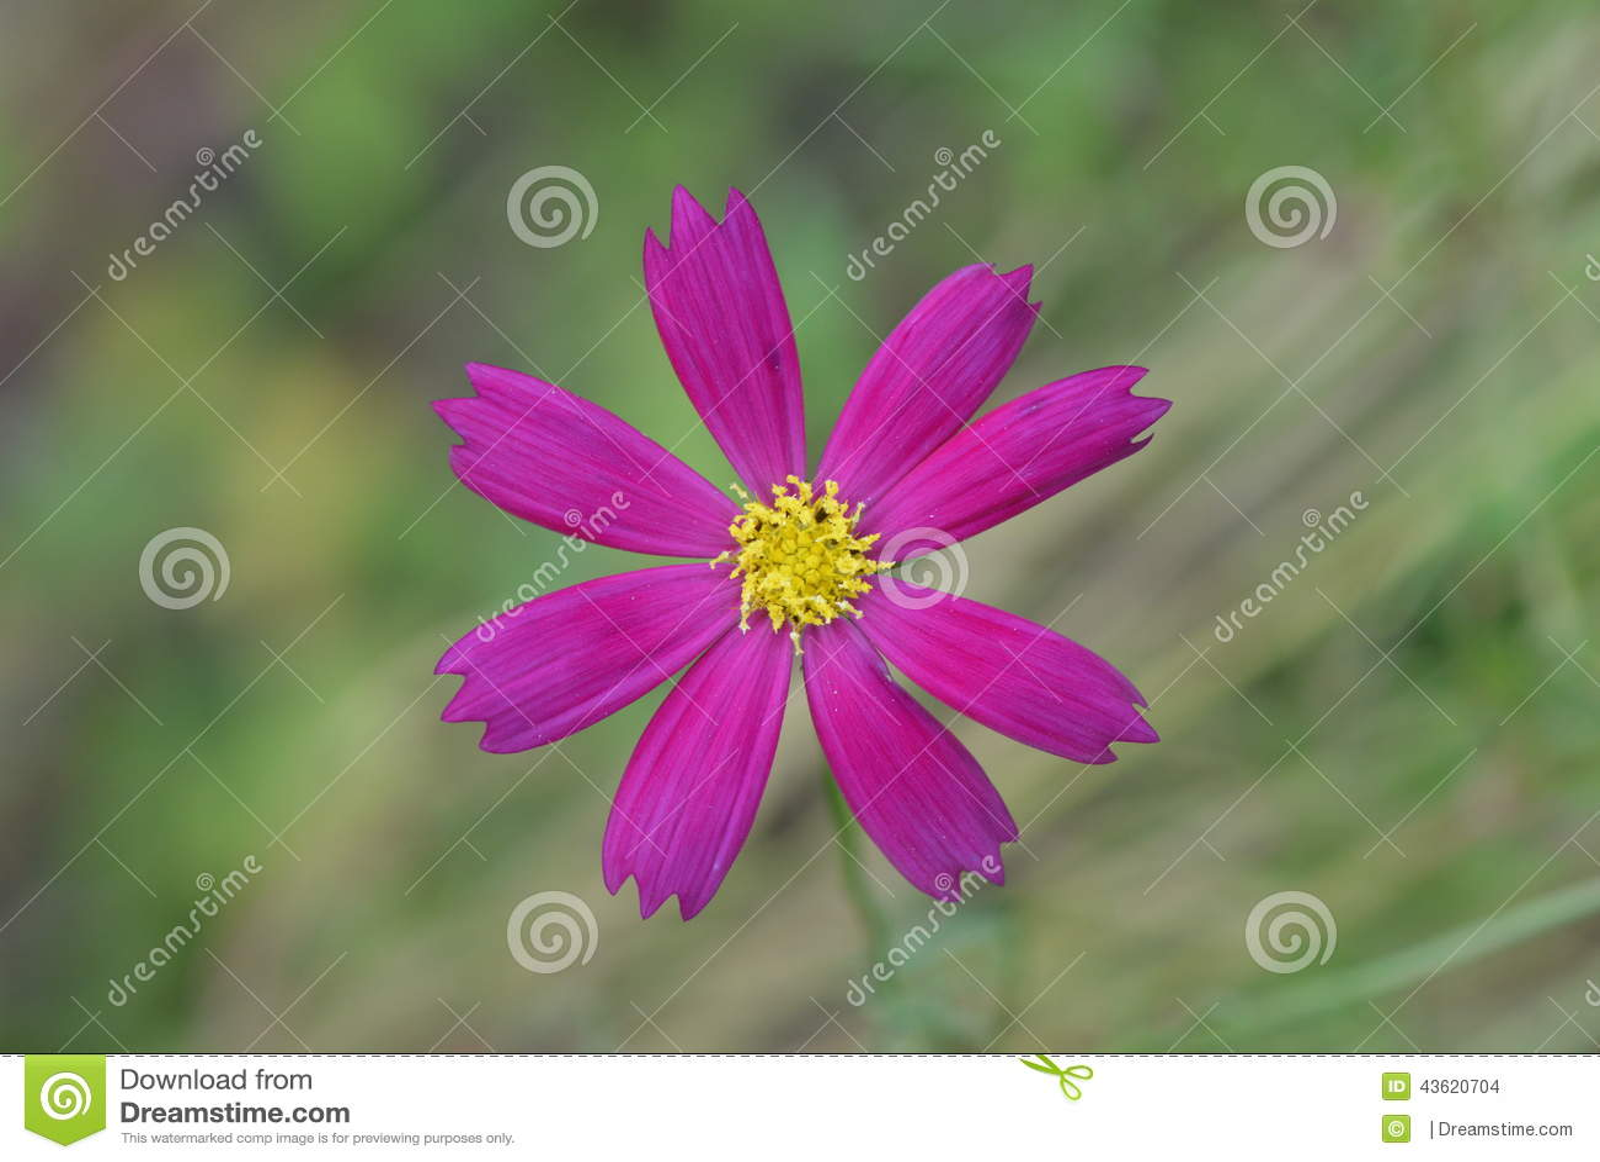 All season outdoor plants-7811